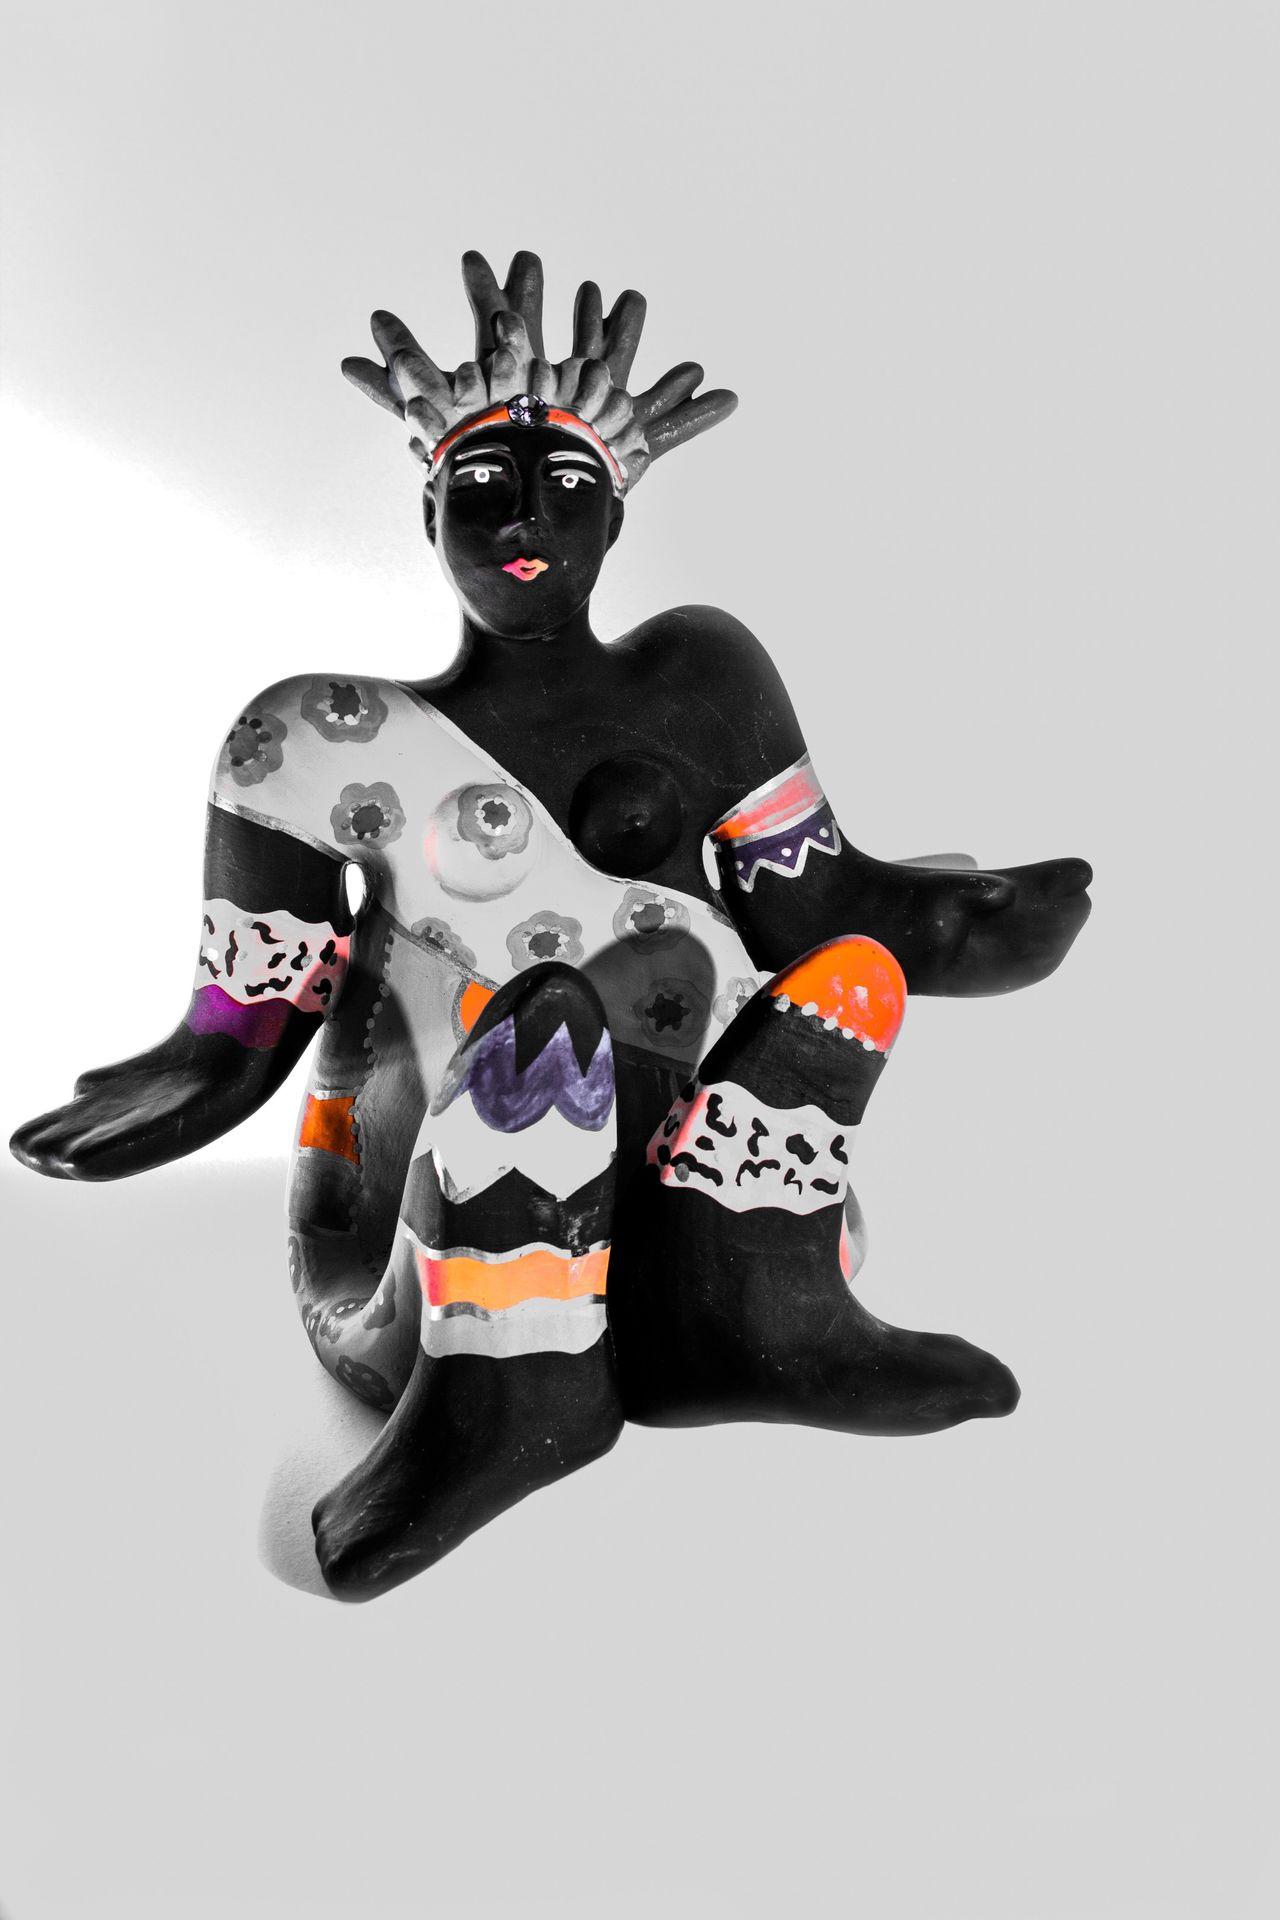 Lieblingsteil Studio Shot White Background No People Clown Day Sculpture Full Length Close-up Decorative Decoration Fleemarket